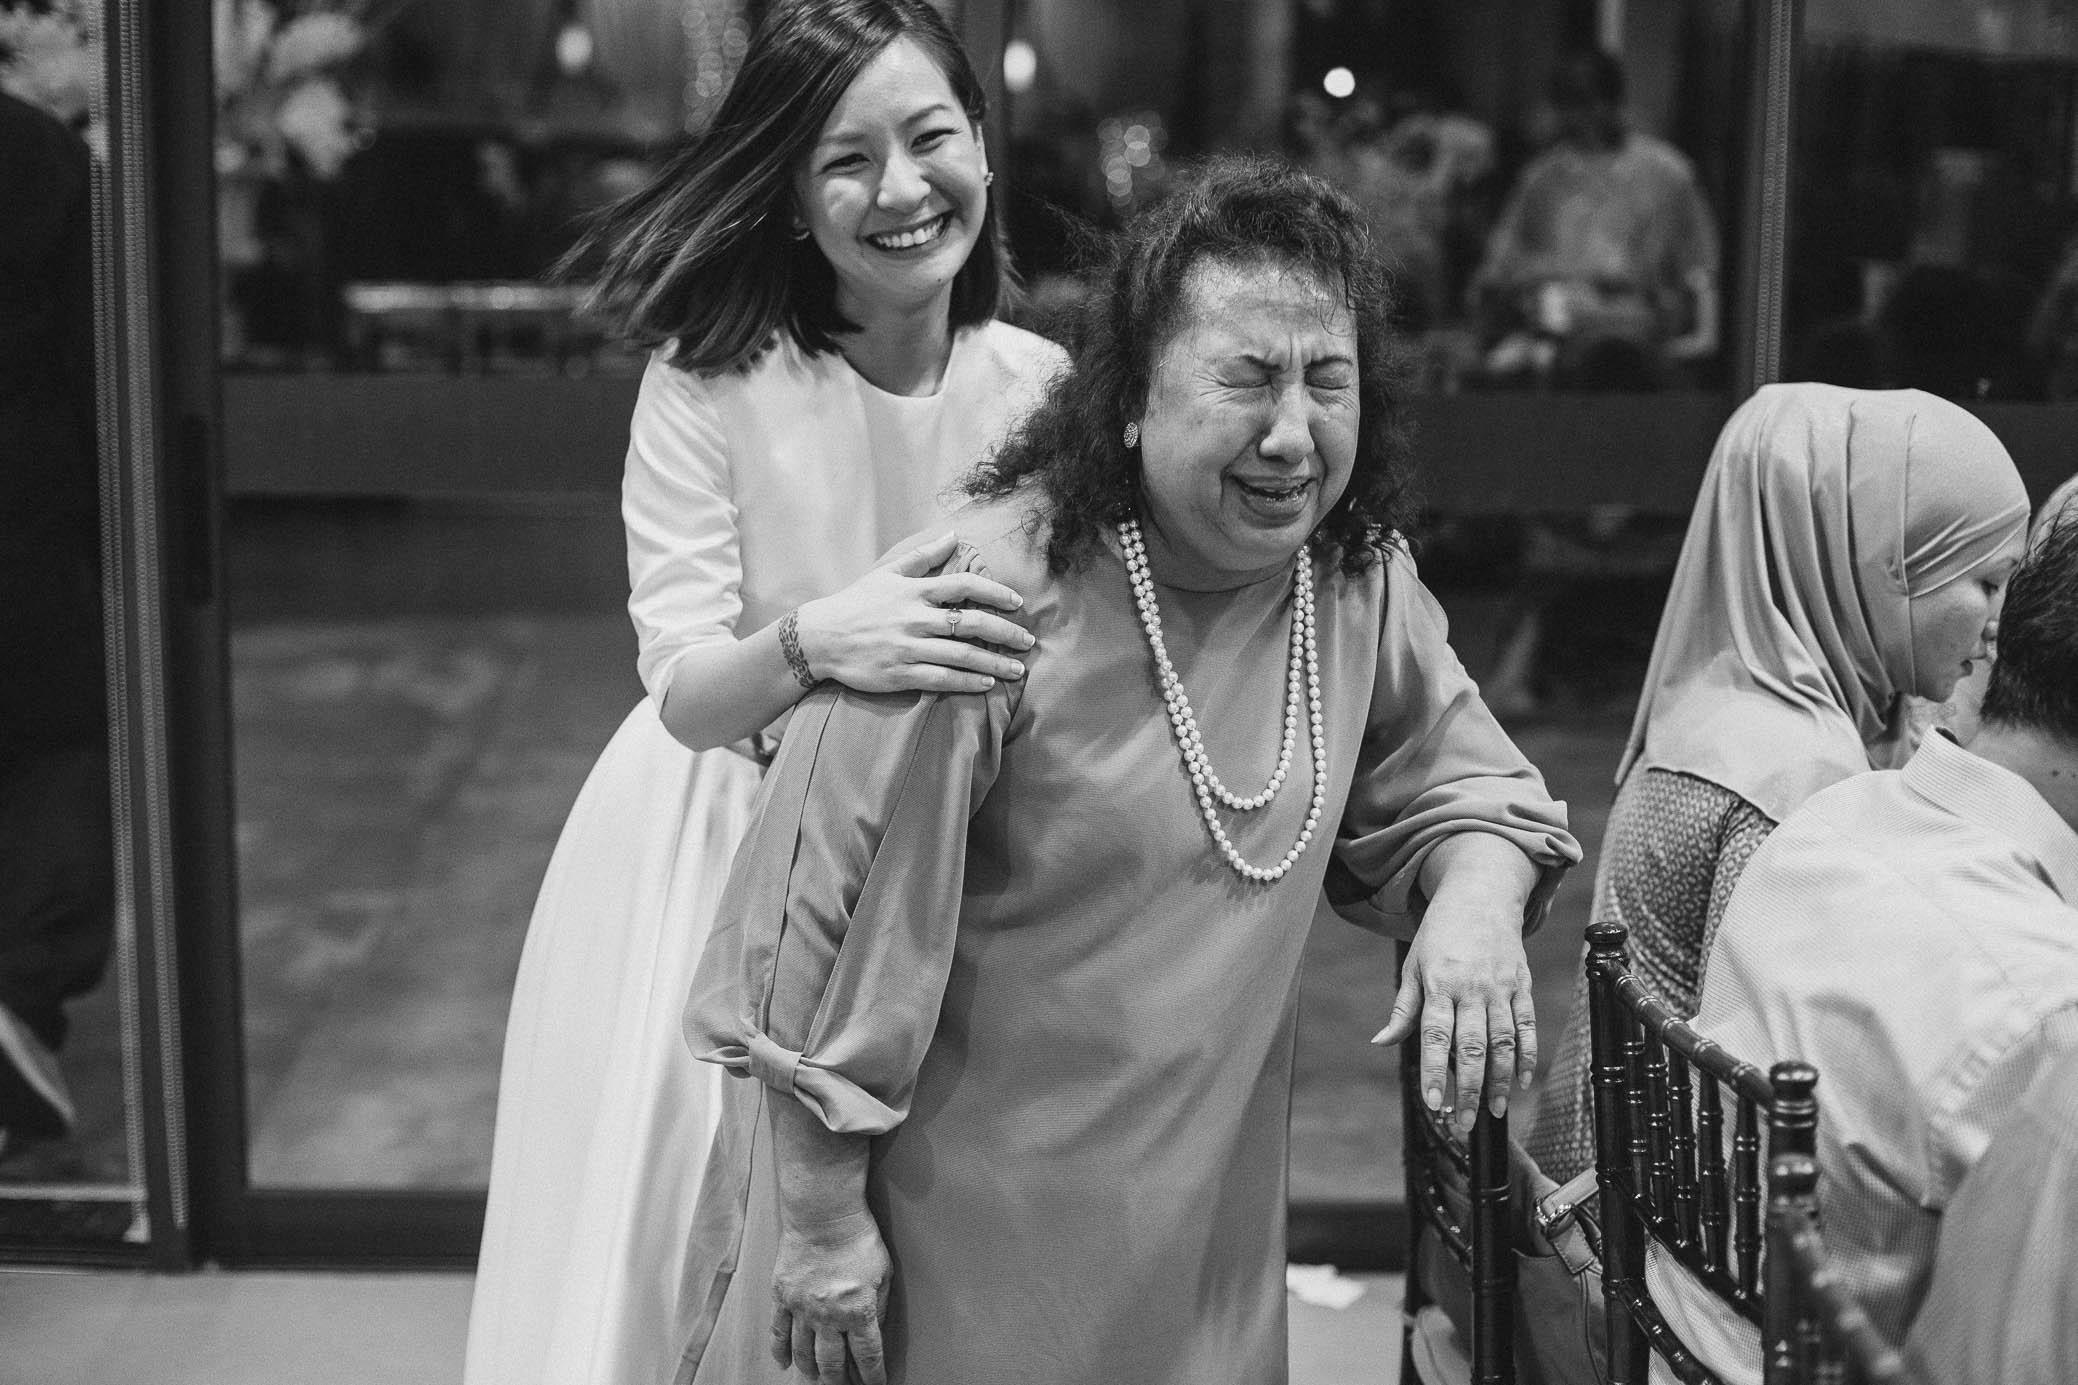 singapore-wedding-photographer-malay-indian-pre-wedding-travel-wmt-2015-85.jpg